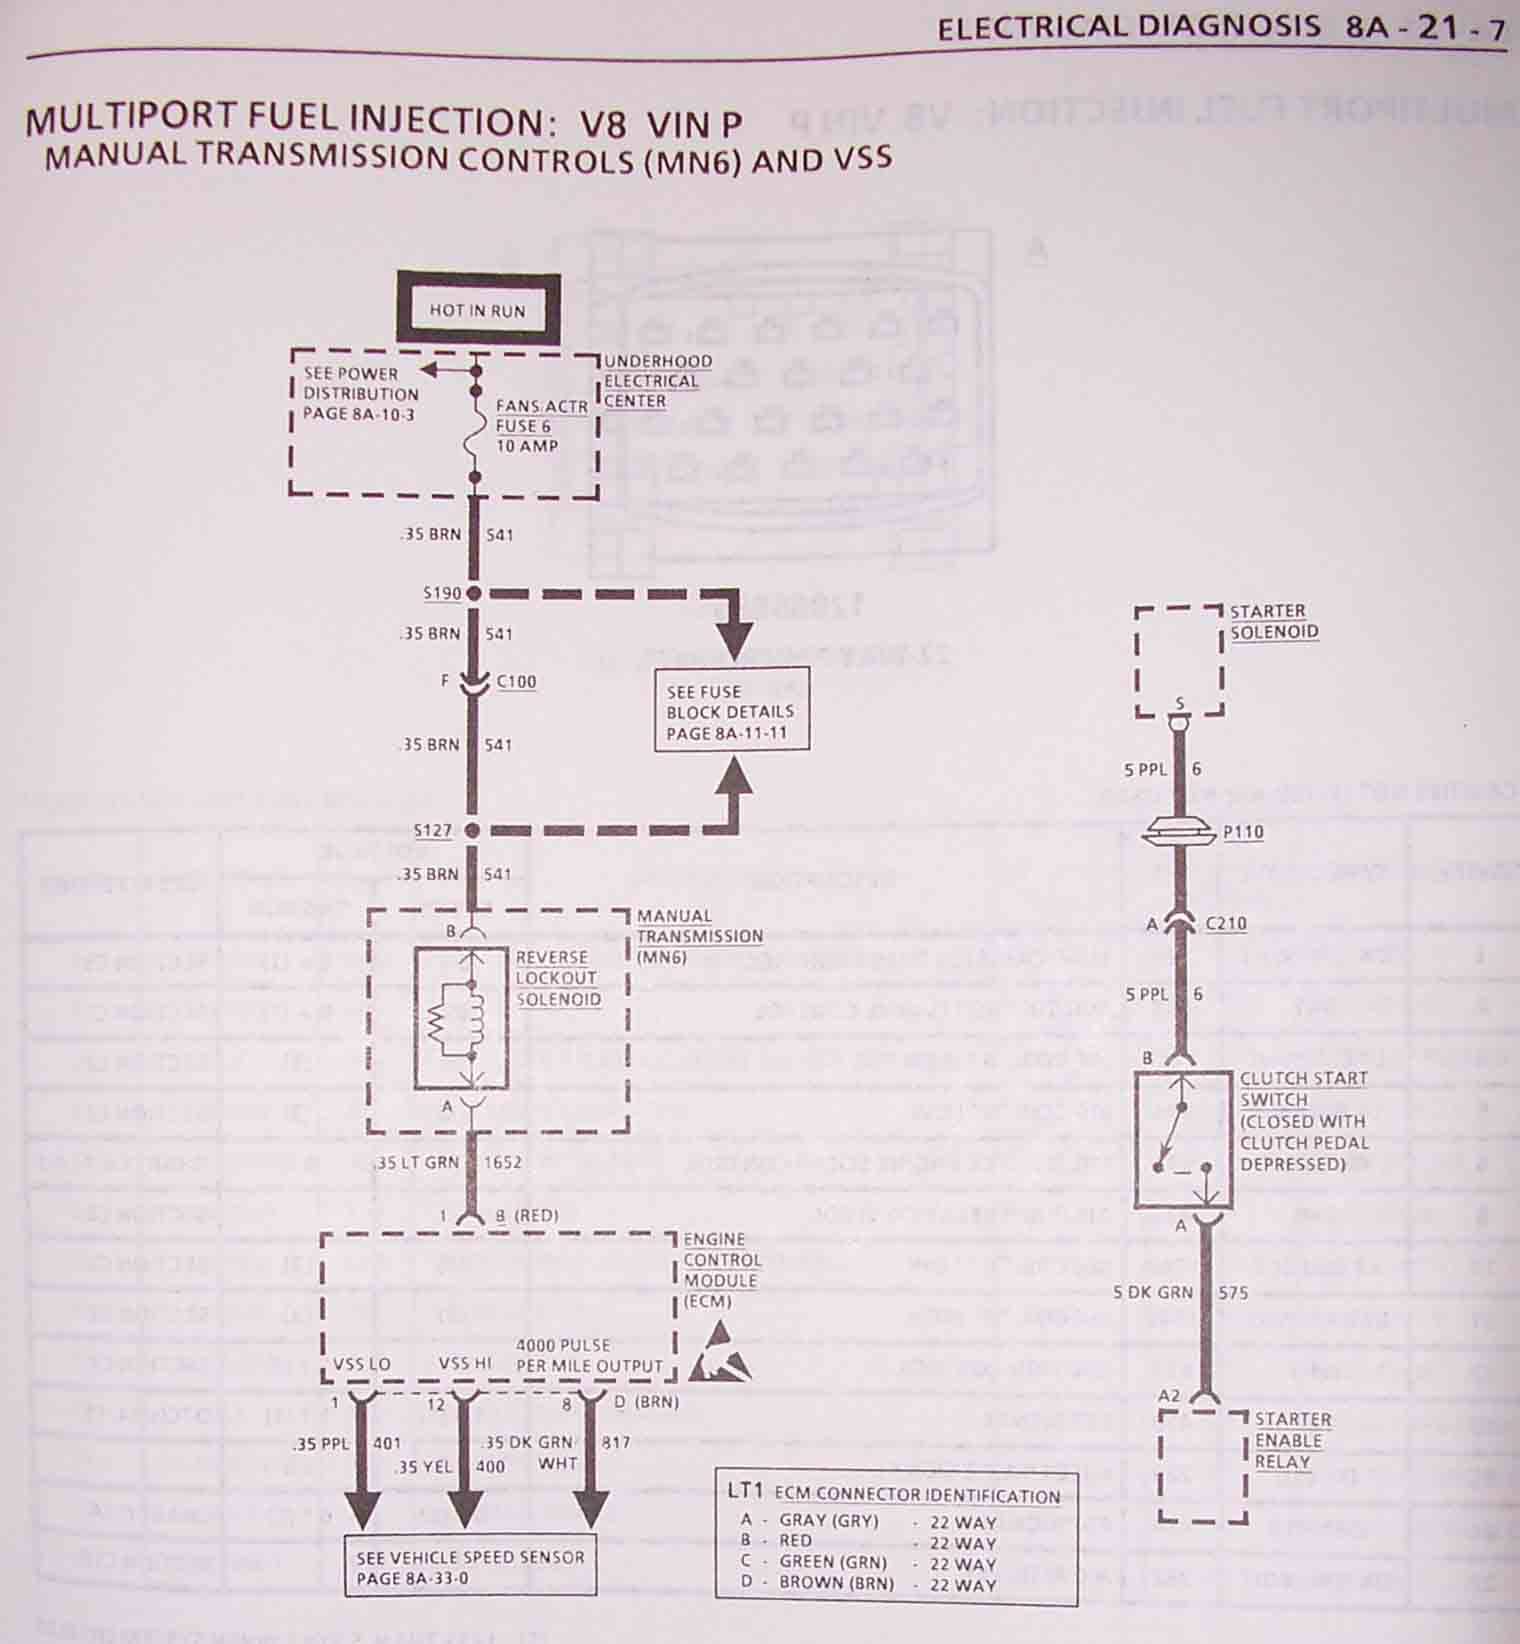 1993 Lt1 Wiring Diagram Vss Great Design Of 1991 700r4 Diagrams Pcm Wire Plug Gm